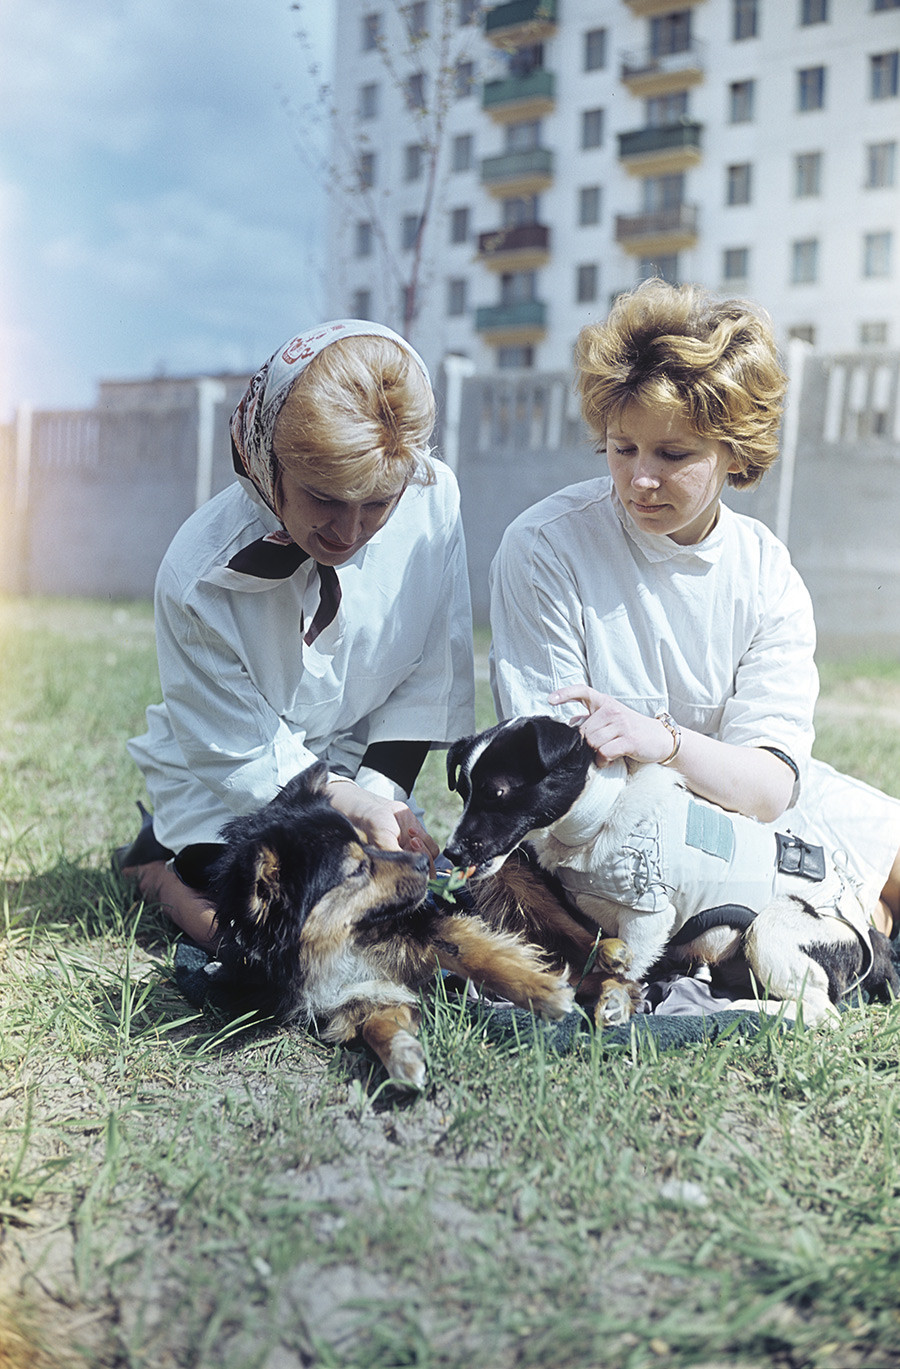 Пси Ветерок (десно) и Угољок у шетњи са лаборантима института ИМБП.